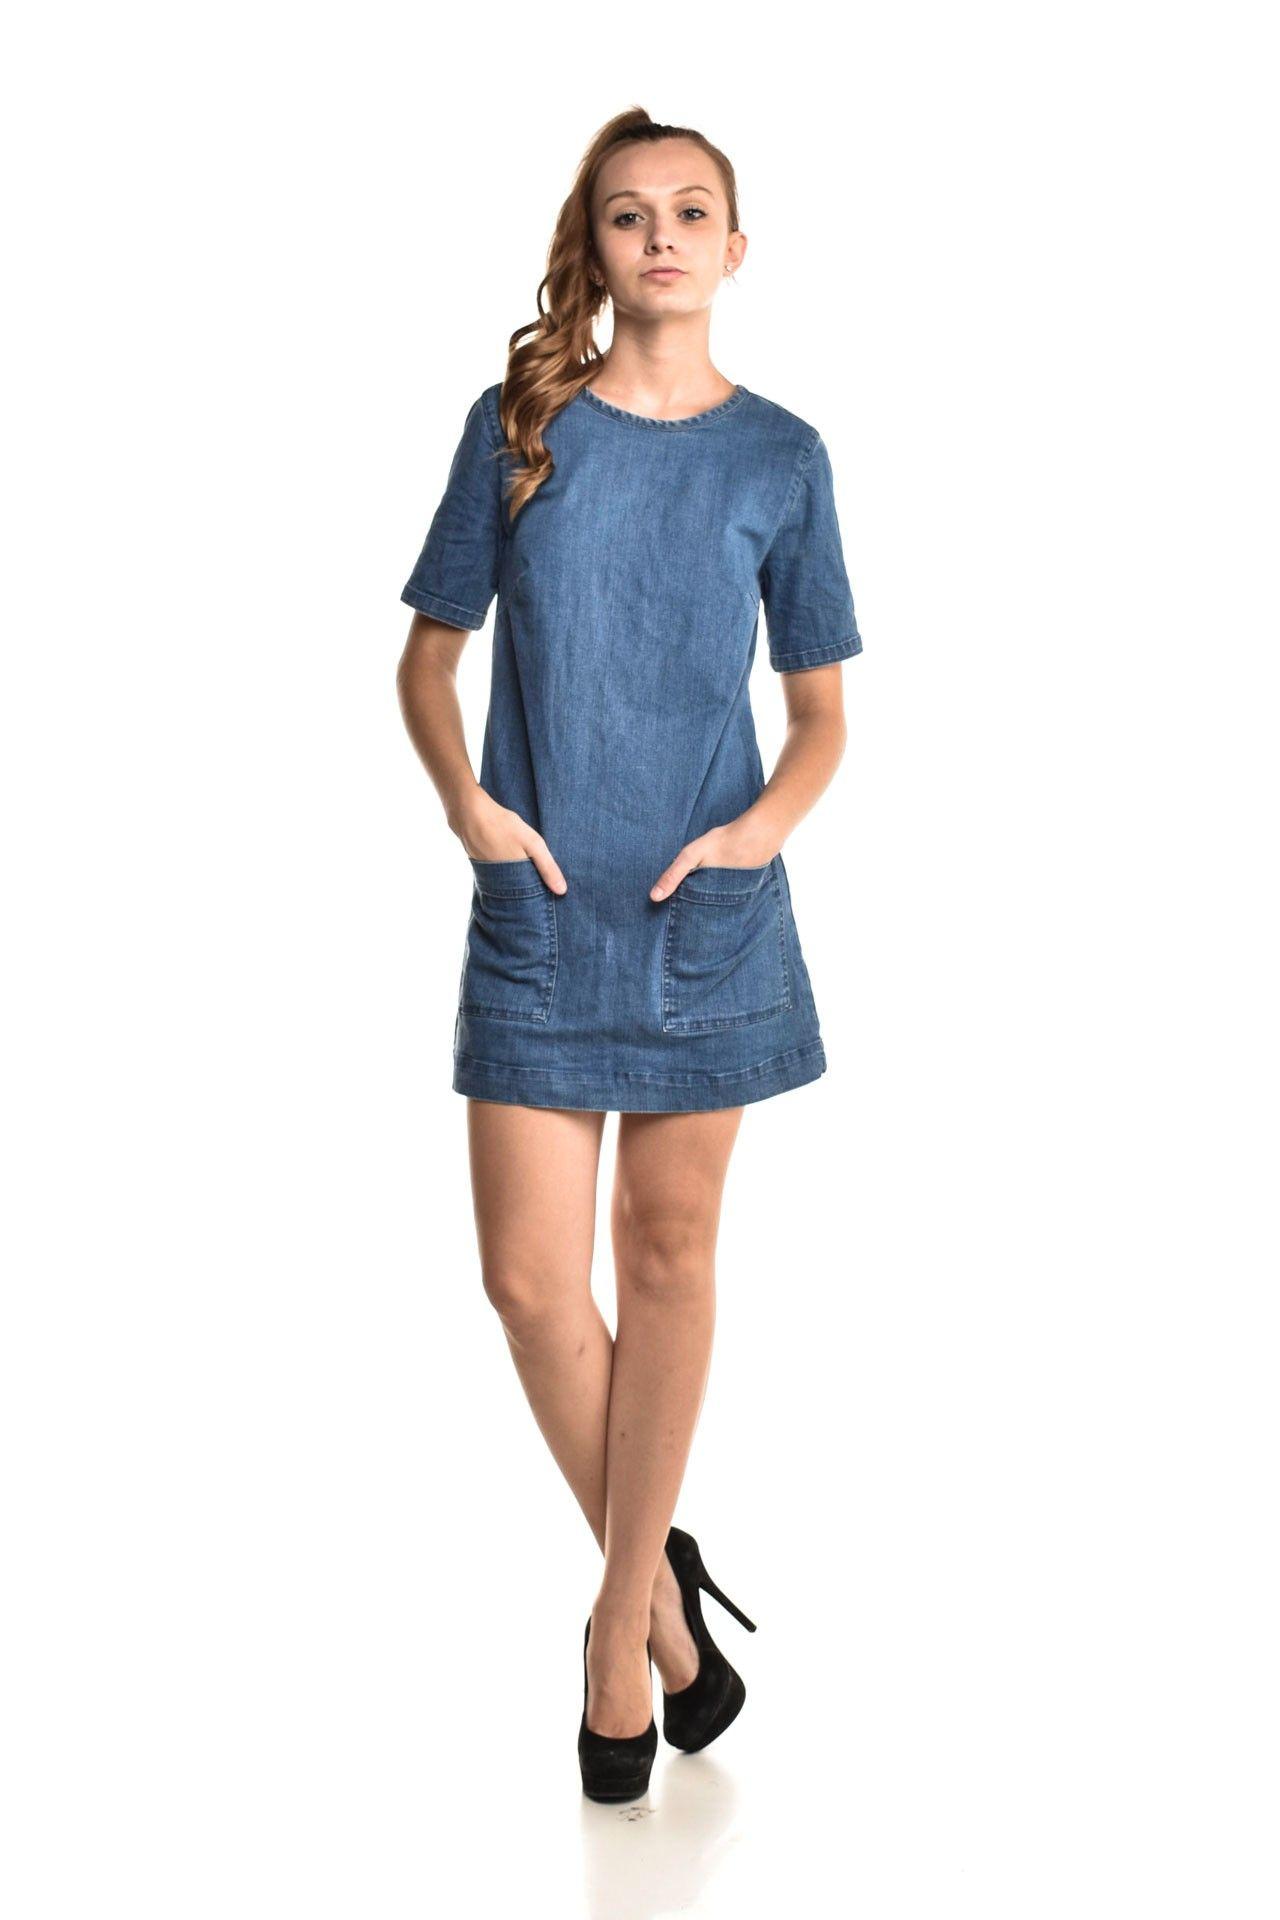 Forever 21 - Vestido Jeans Bolso - Foto 2